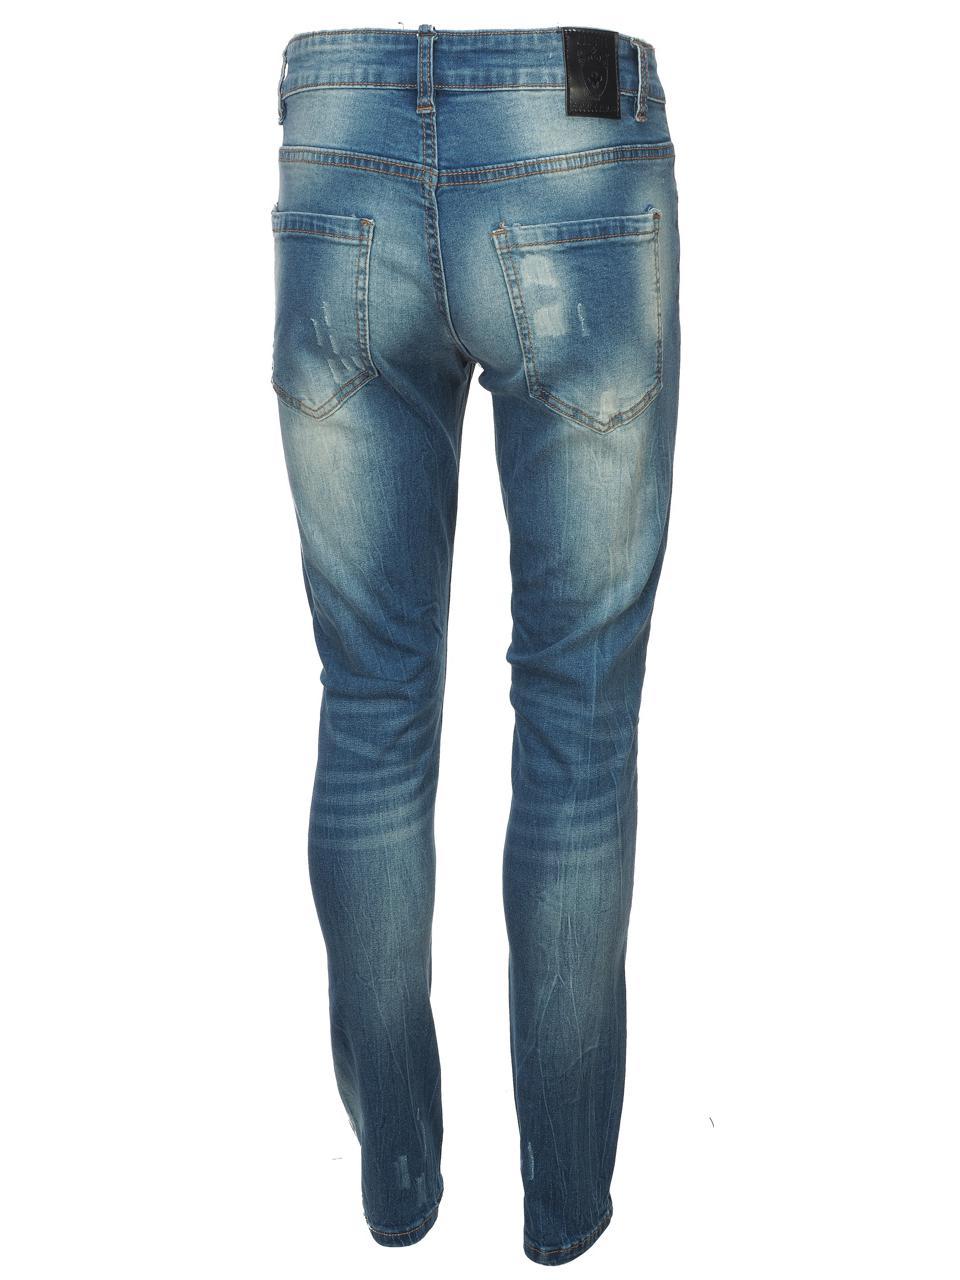 Jeans-Pants-Hite-Couture-Kimit-Blue-Blue-Jeans-56935-New thumbnail 5